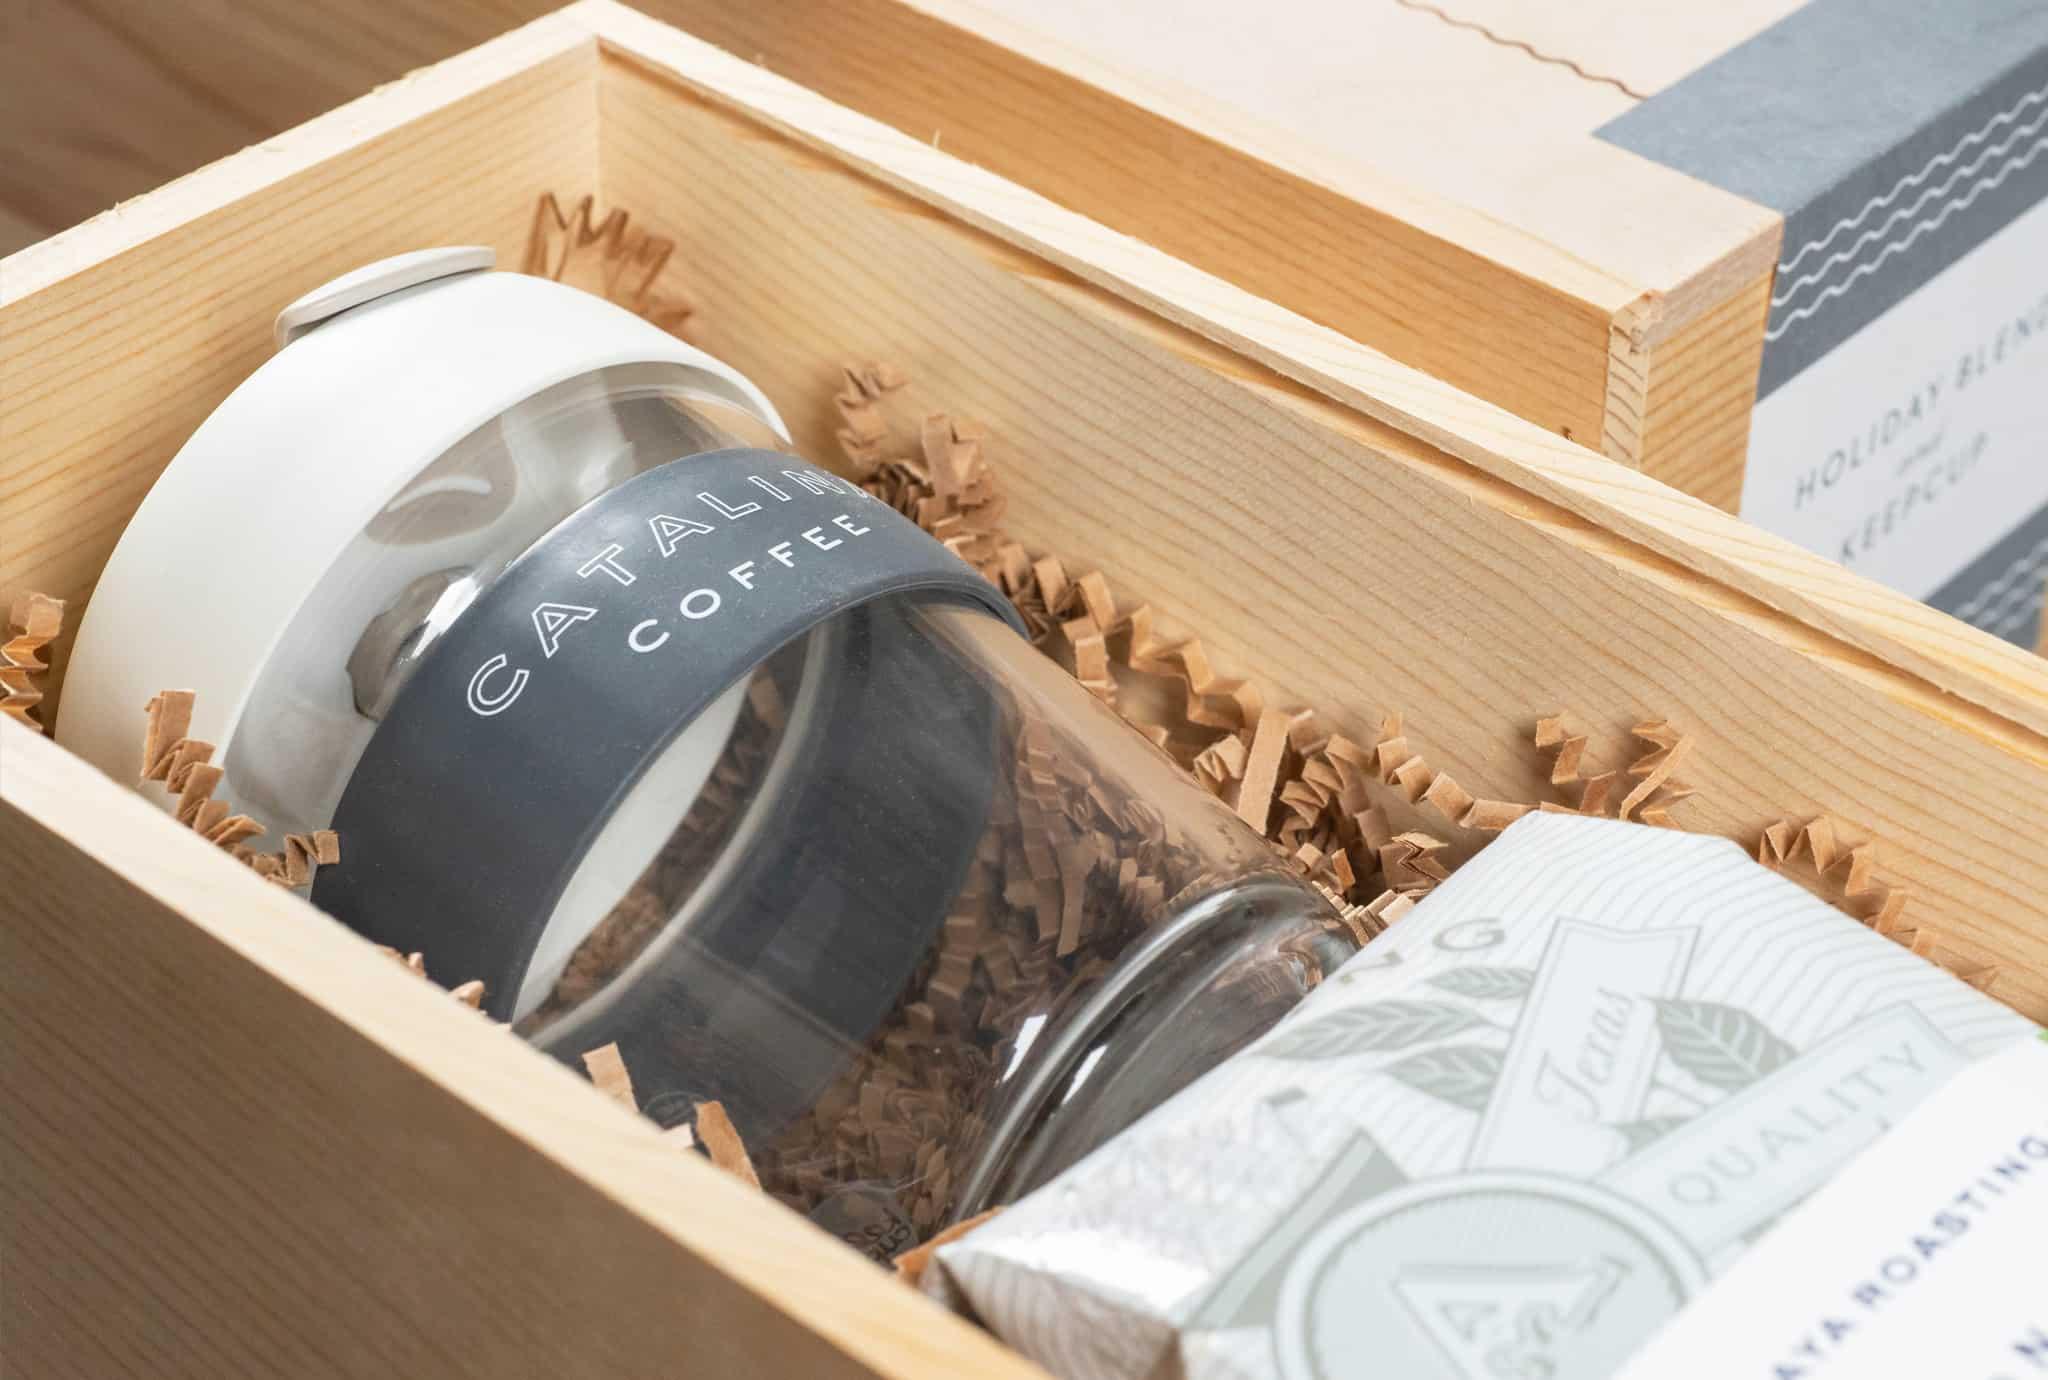 FieldofStudy-CatalinaCoffee-Houston Texas Packaging Design